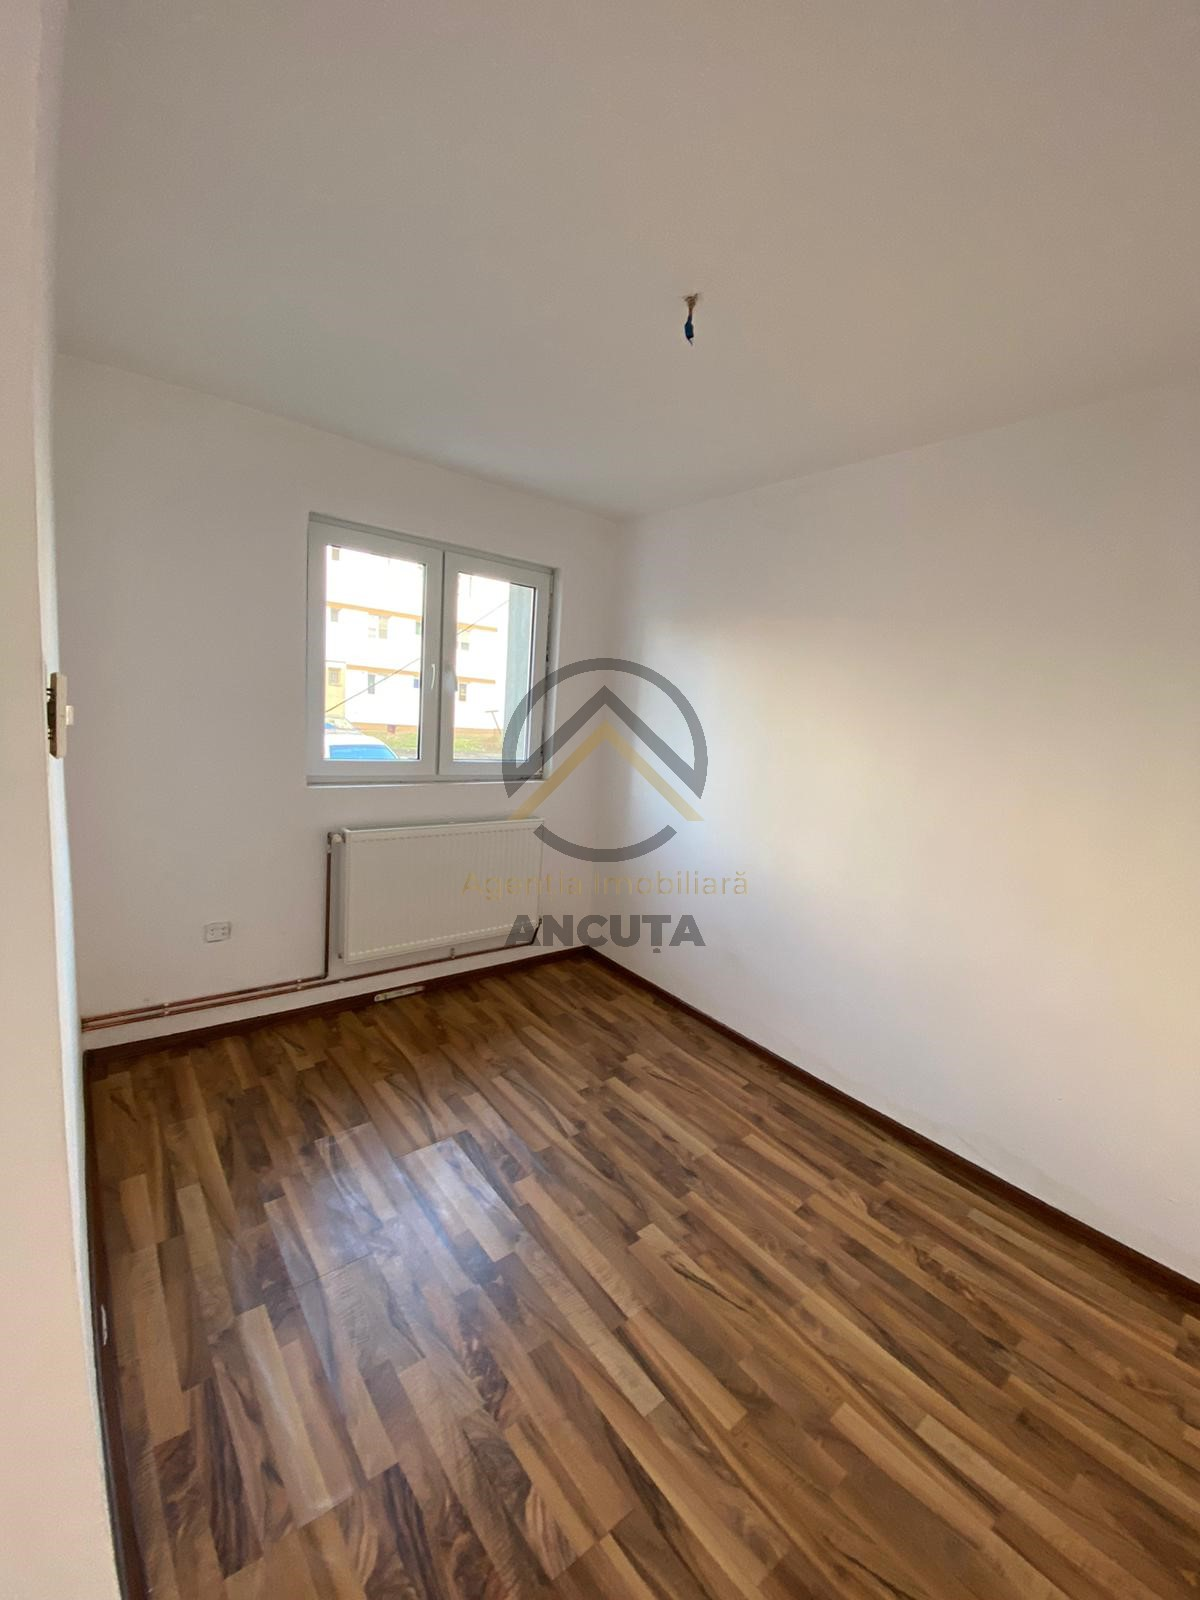 188778-Vanzare apartament 2 camere, Gherla, Cluj